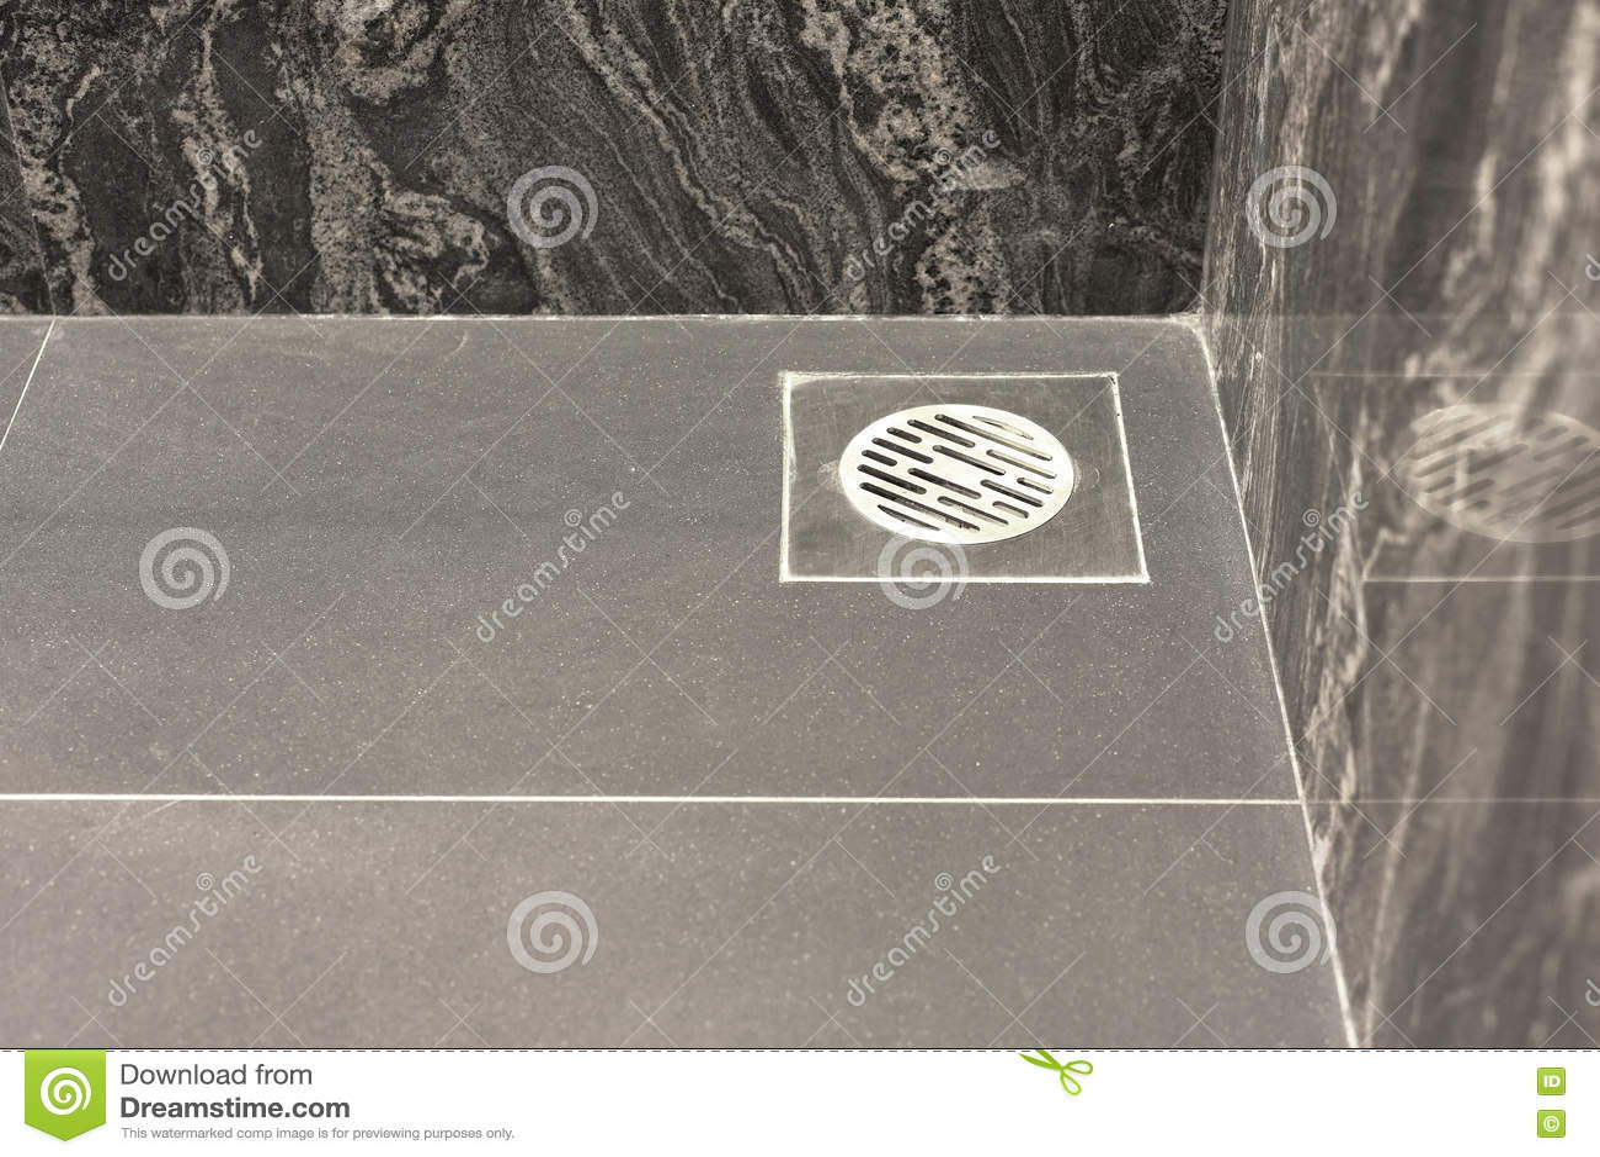 Fußboden Erhöhen Bad ~ Badezimmer fußboden bilder pvc boden bad cool fabelhafte boden fr